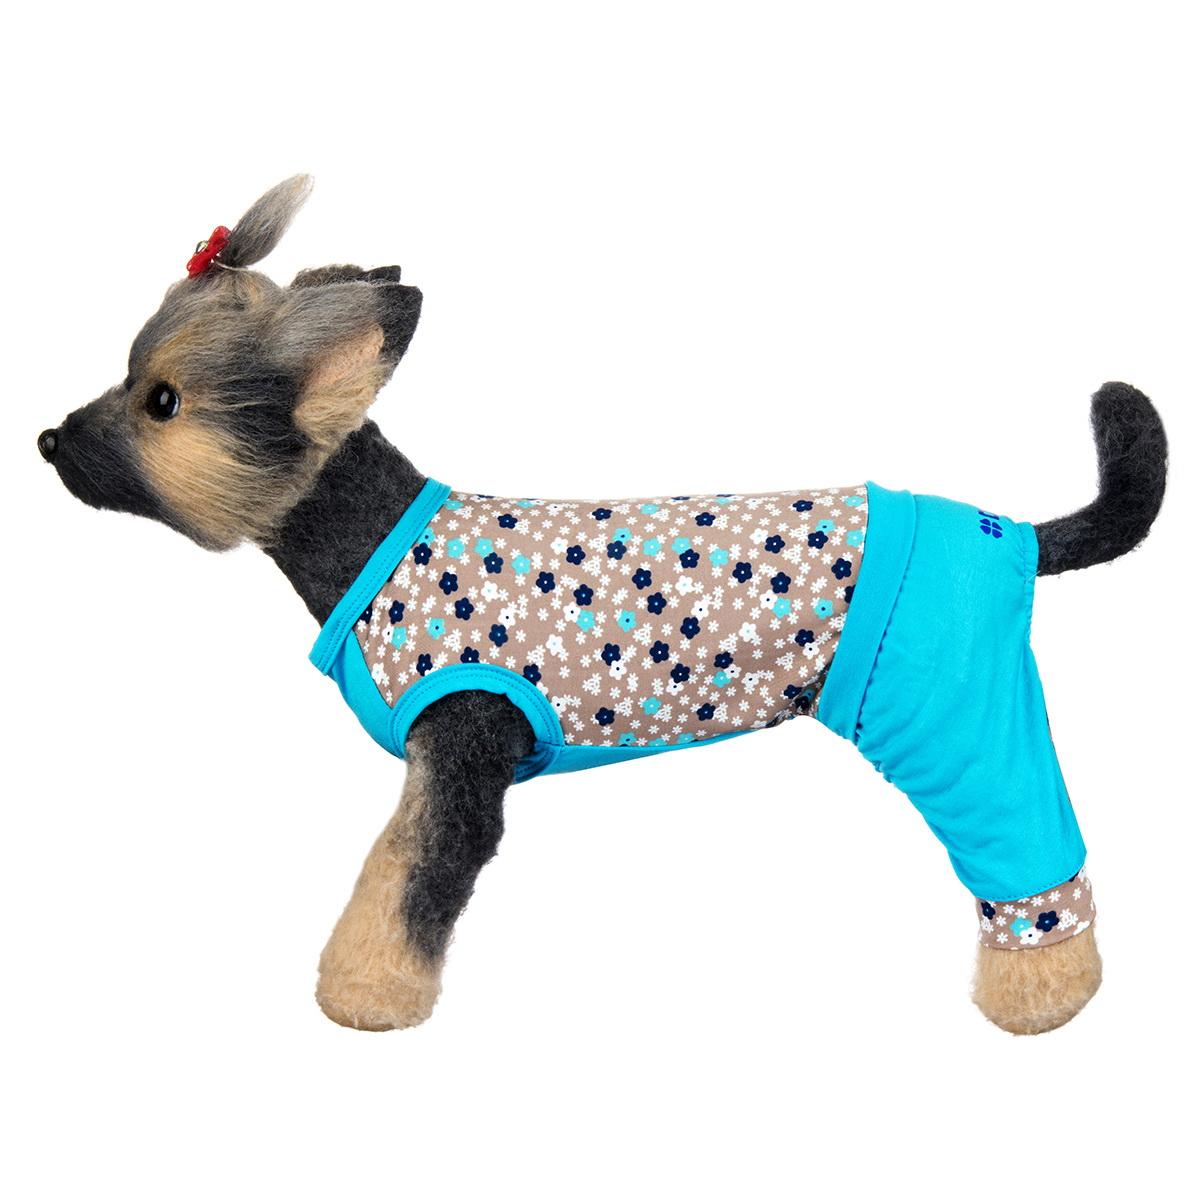 "Комбинезон для собак Dogmoda ""Алекс"", унисекс, цвет: голубой, серый. Размер 1 (S)"